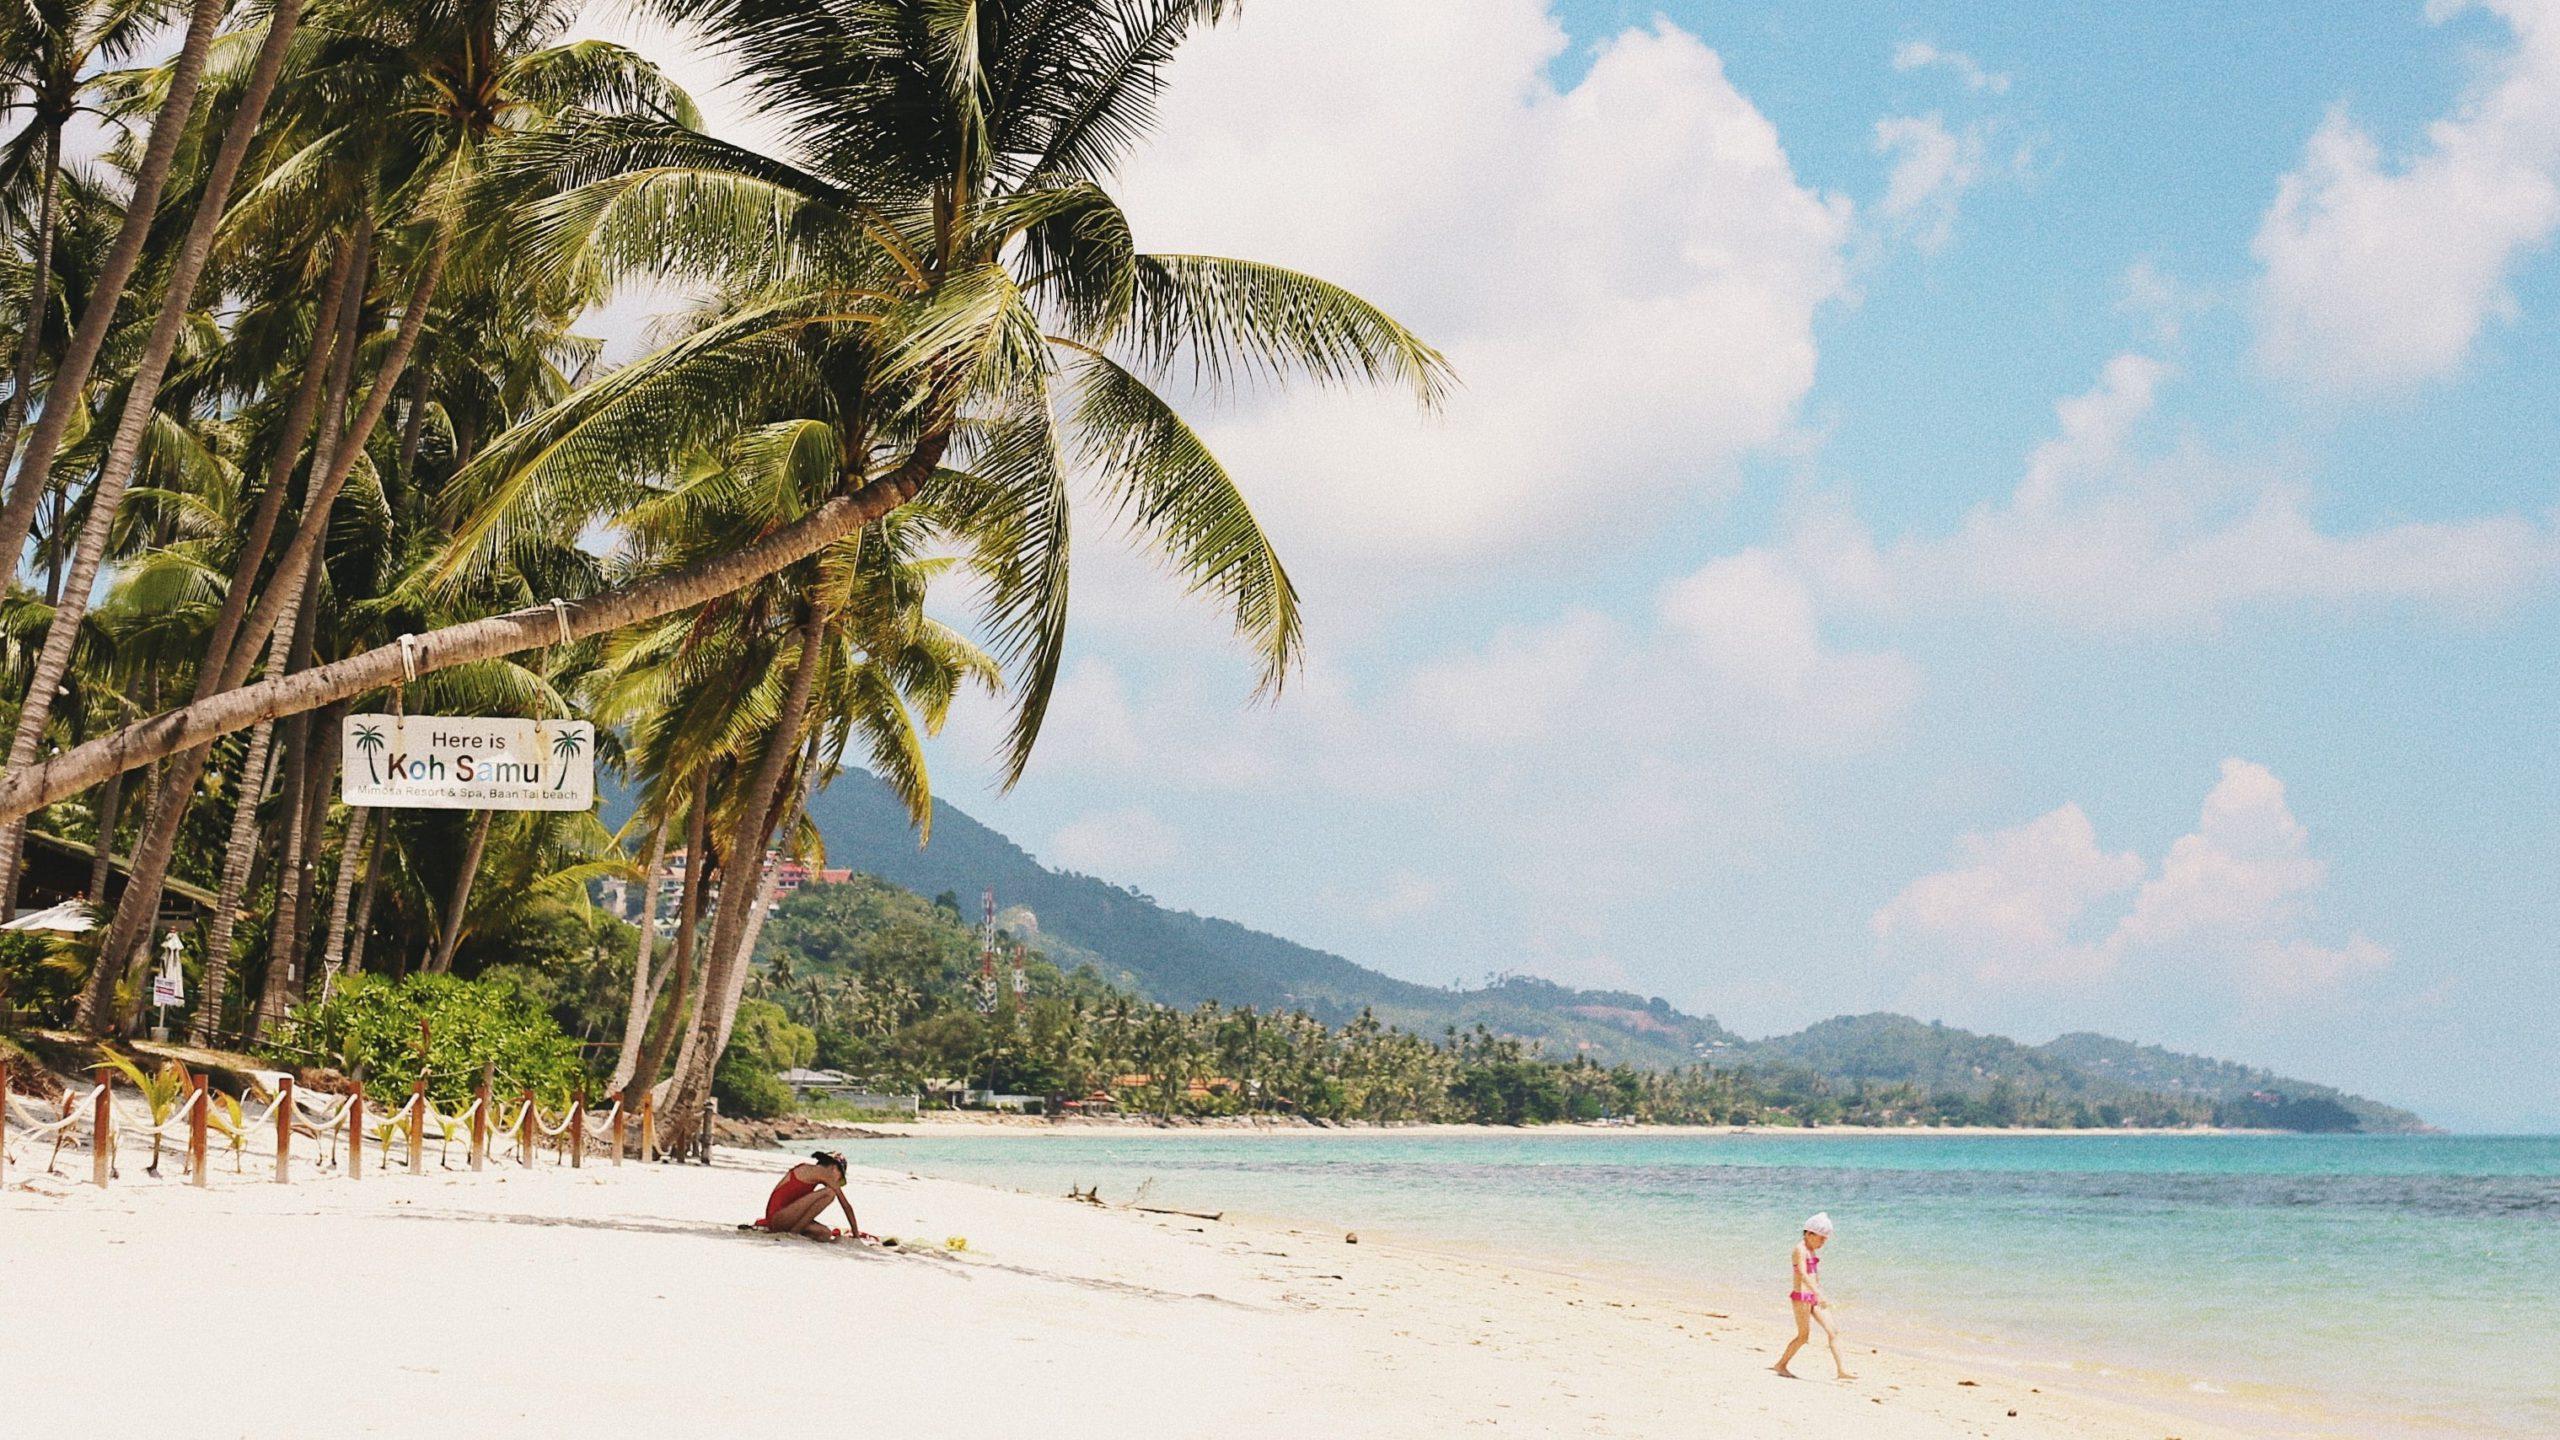 koh samui beach luxe nomad